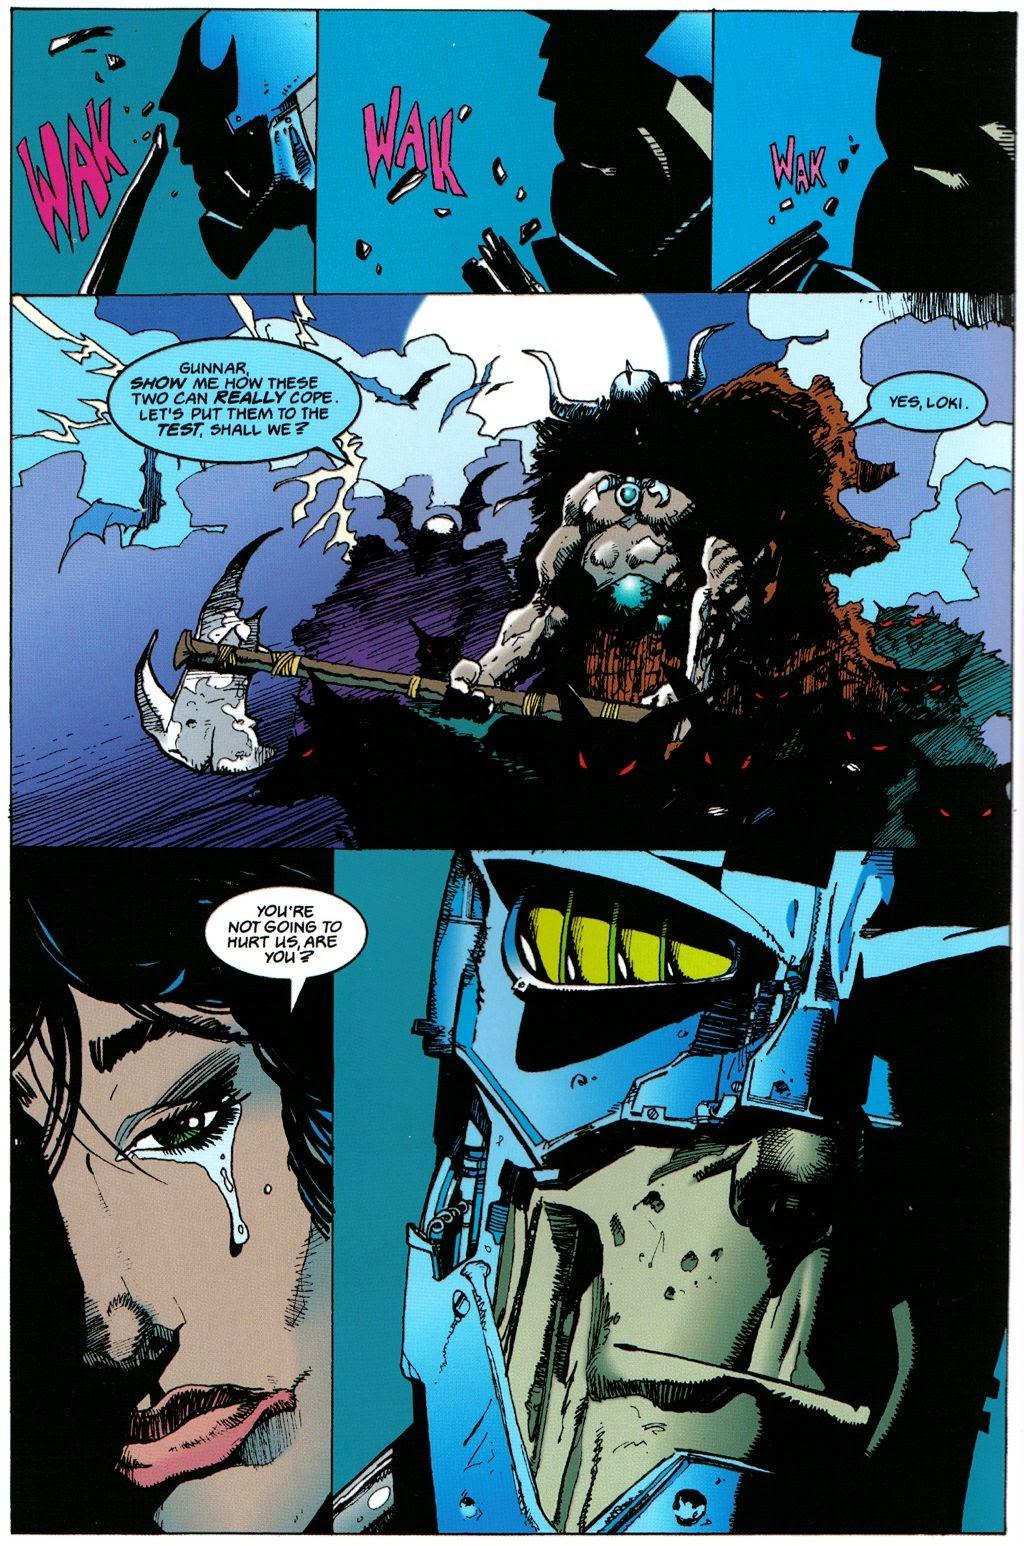 Read online Bisley's Scrapbook comic -  Issue # Full - 10